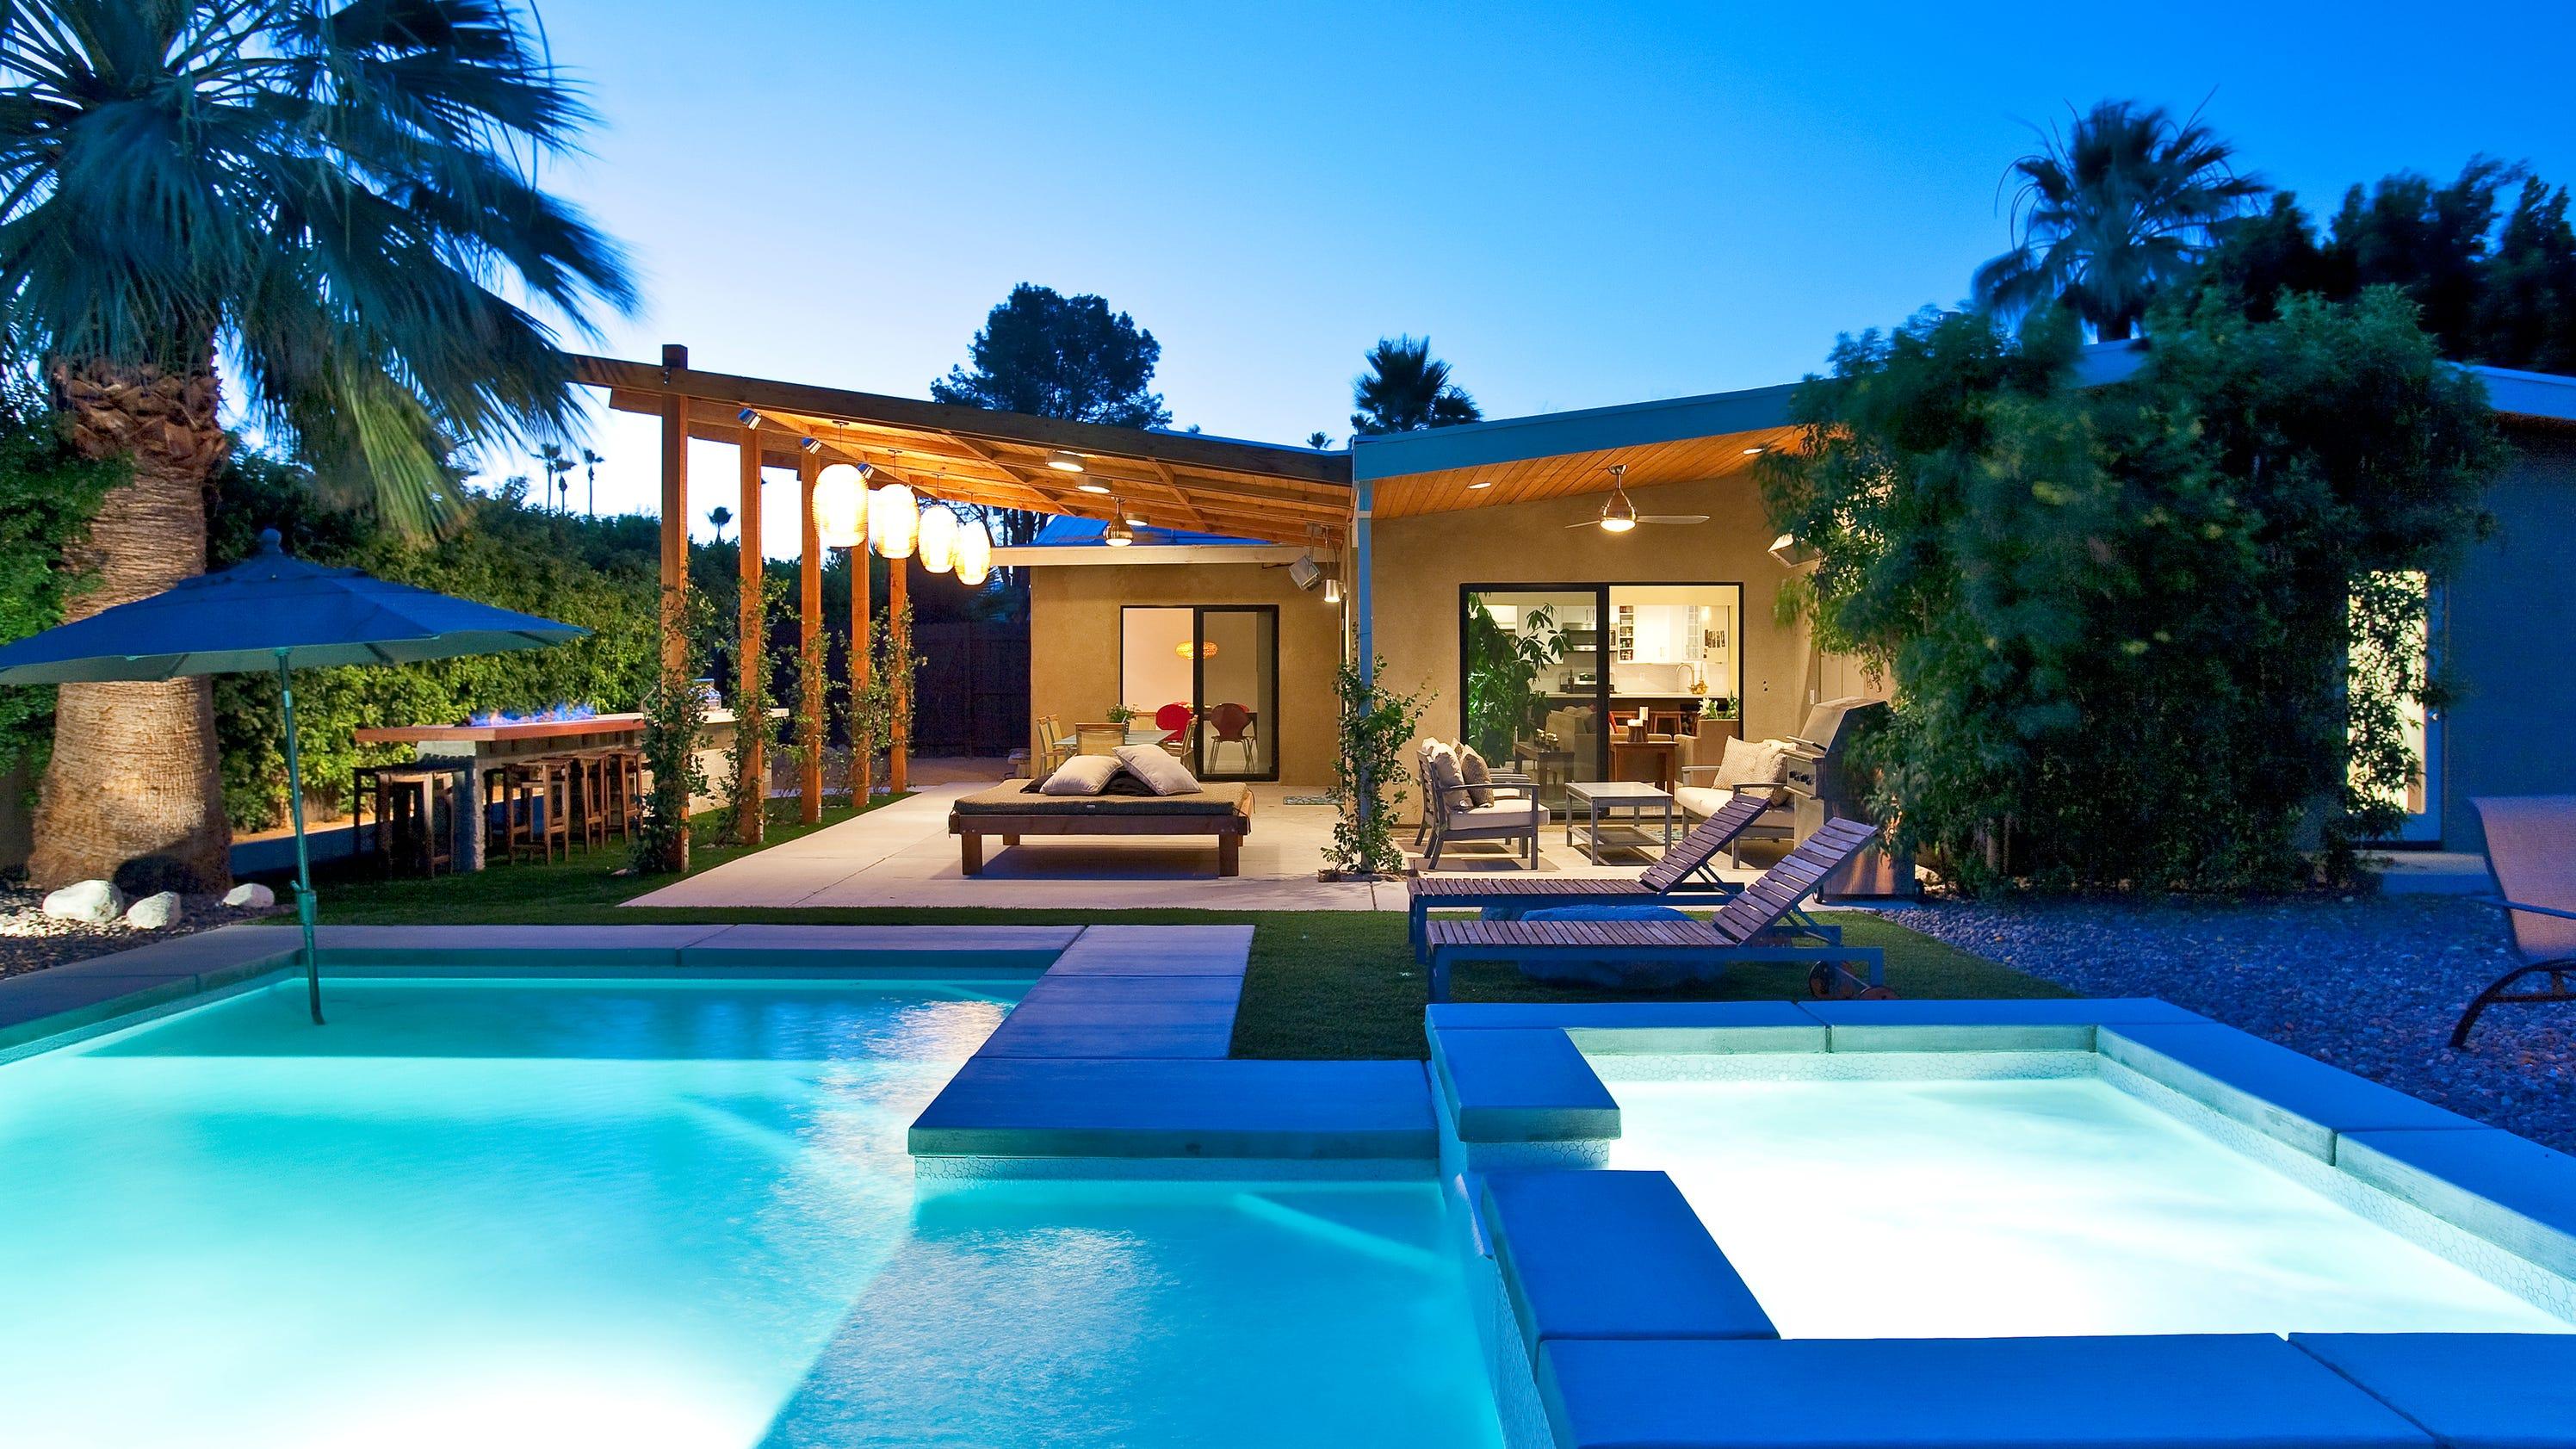 Palm Springs vacation homes are TripAdvisor favorites